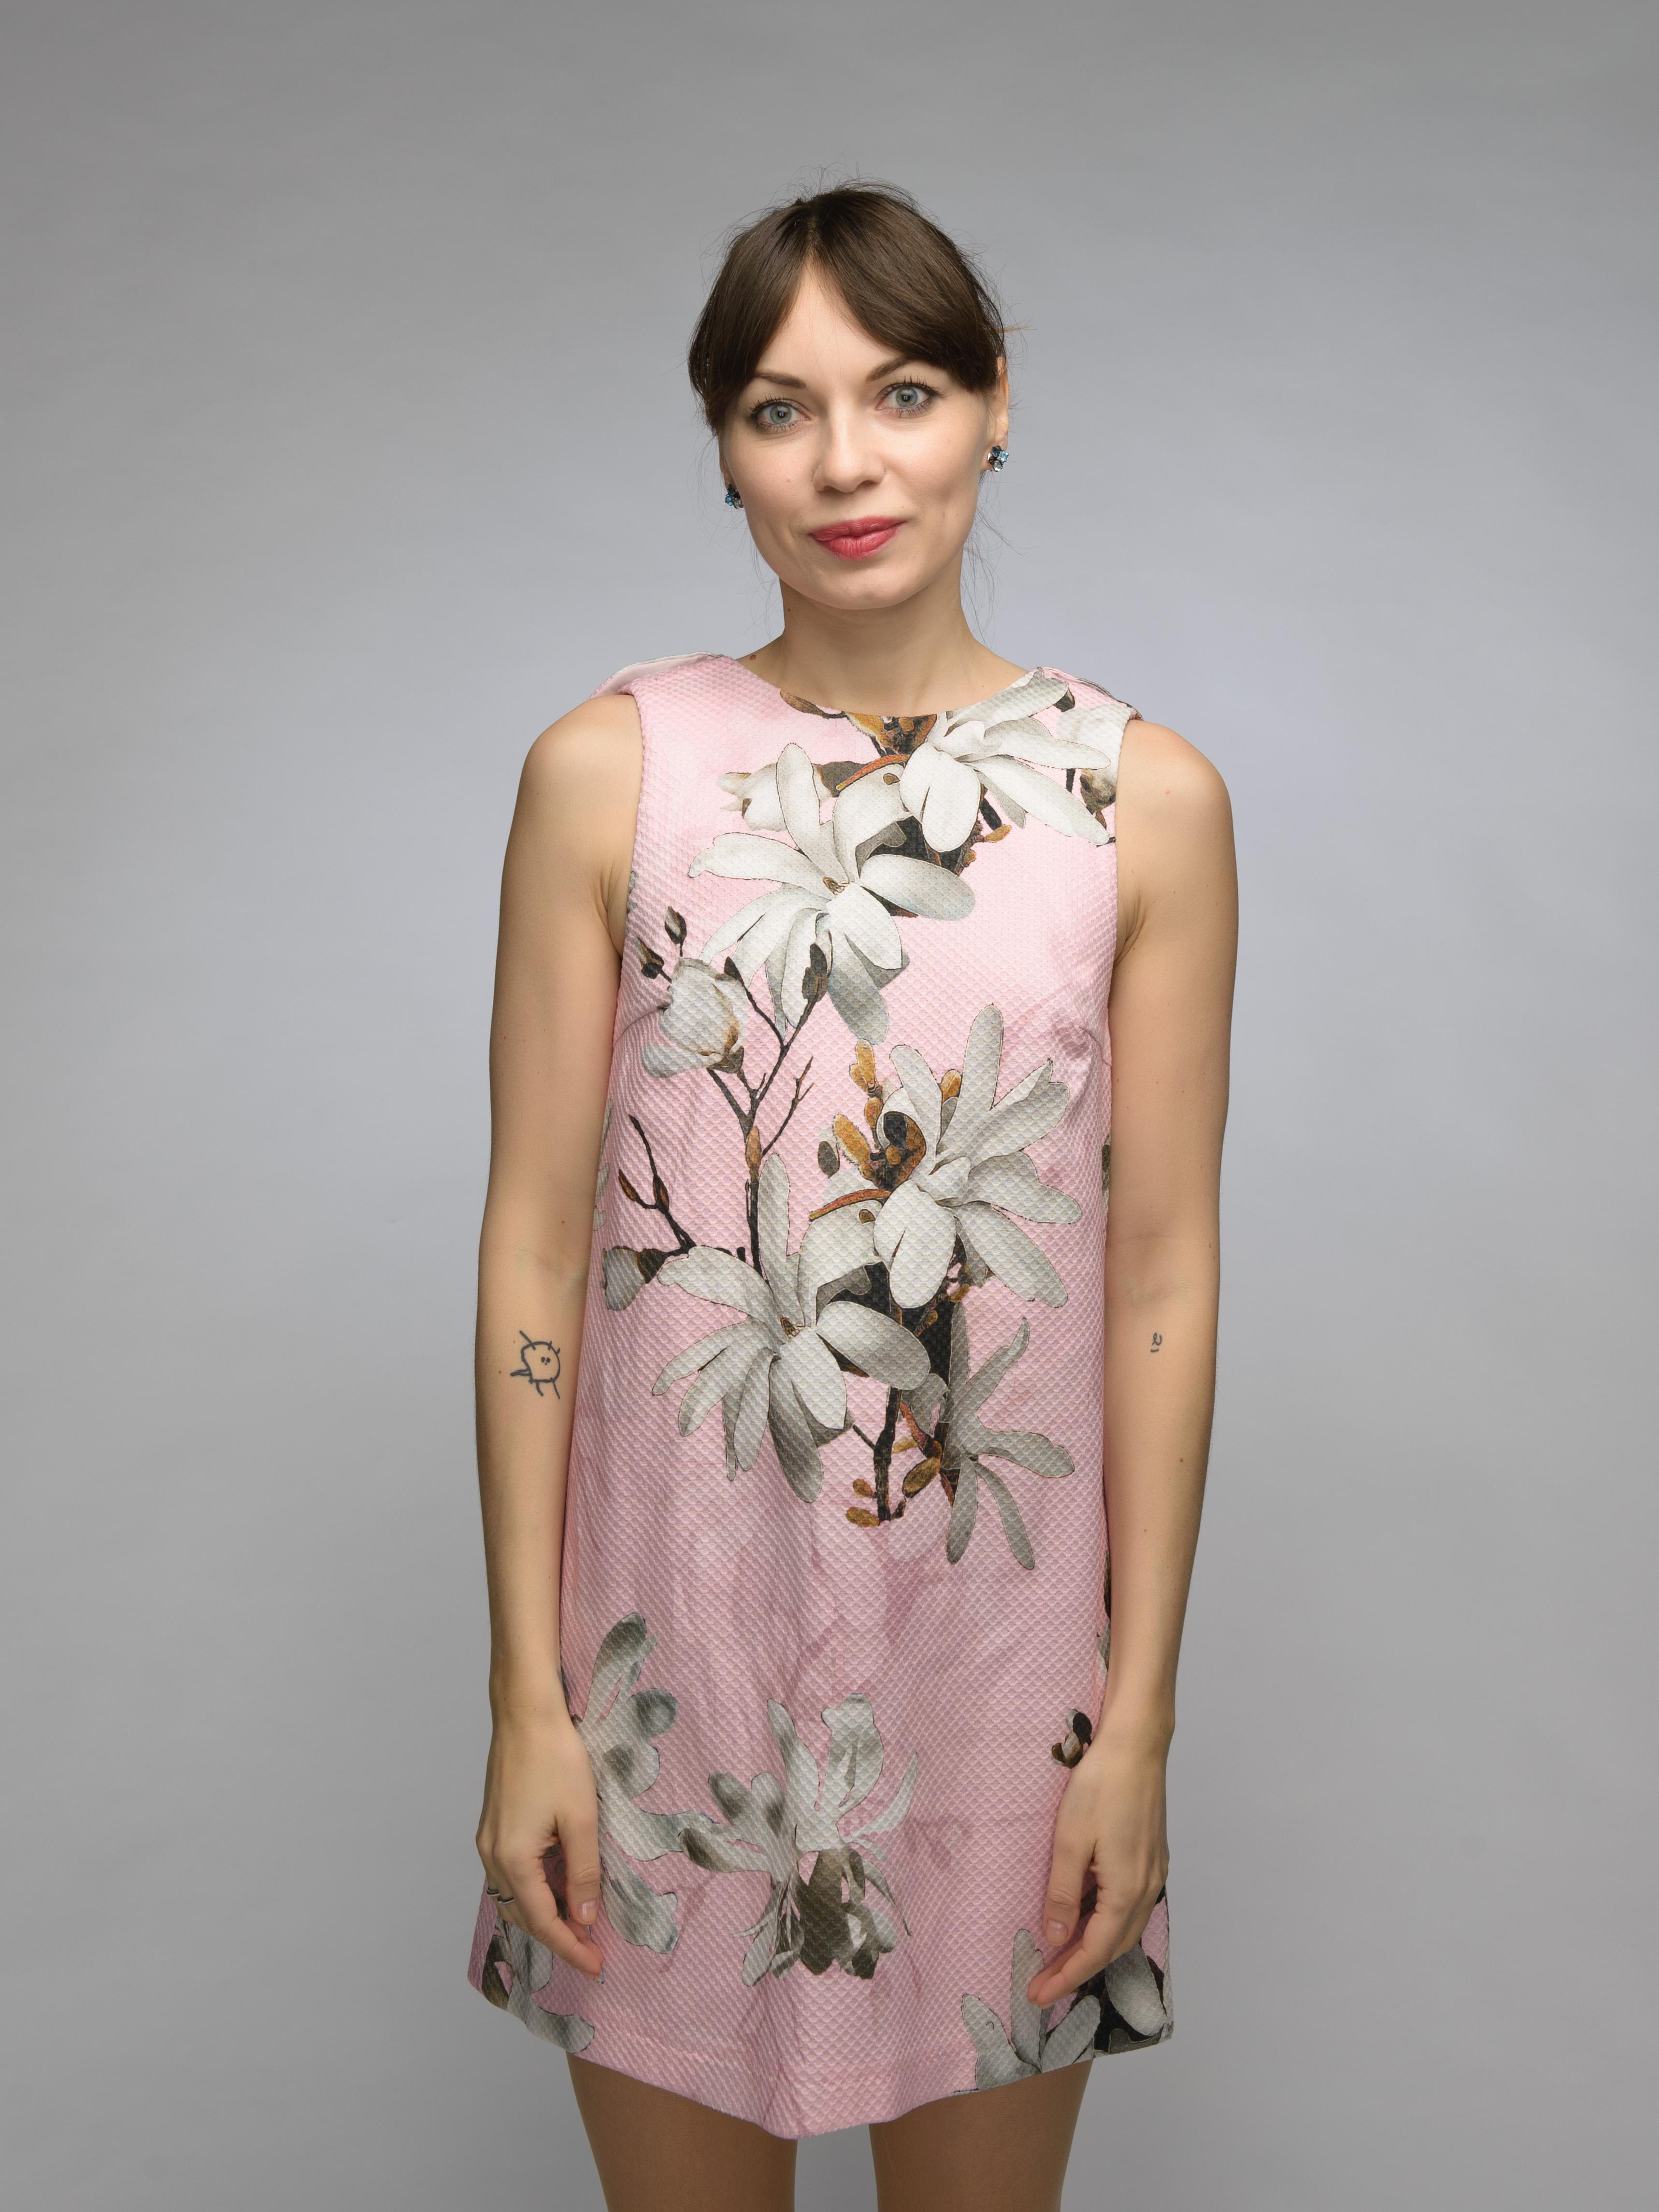 Платье с воланами на спине в магазине «Littleblack» на Ламбада-маркете e9dd7b8f89b